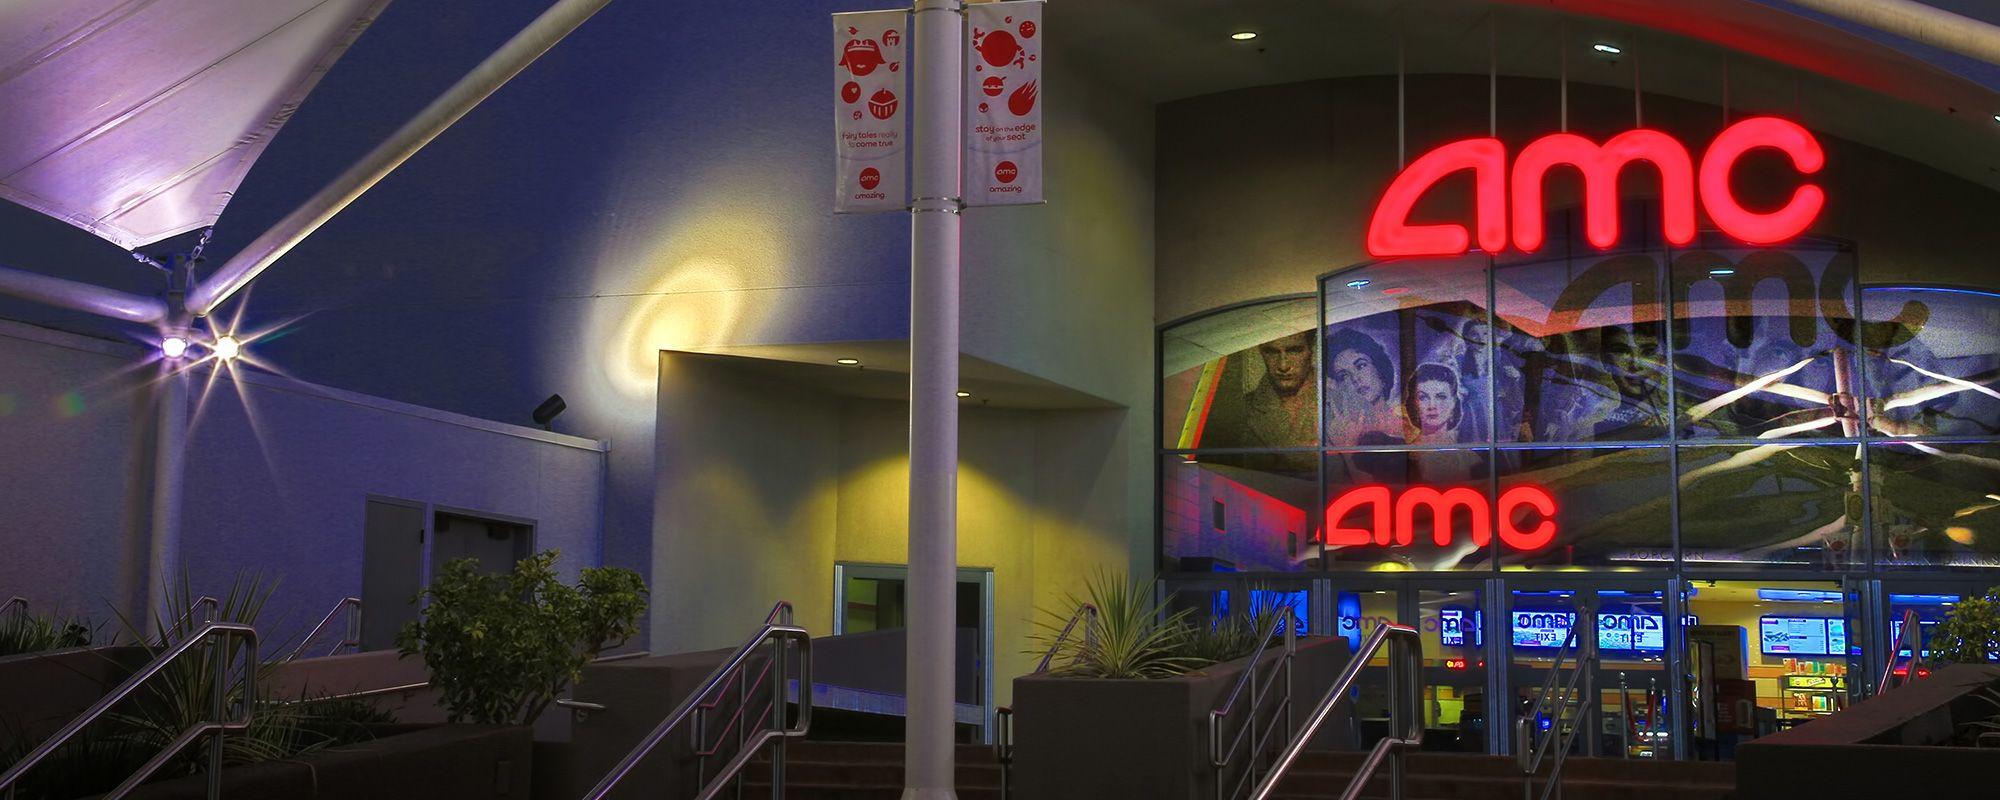 amc movie theater online application